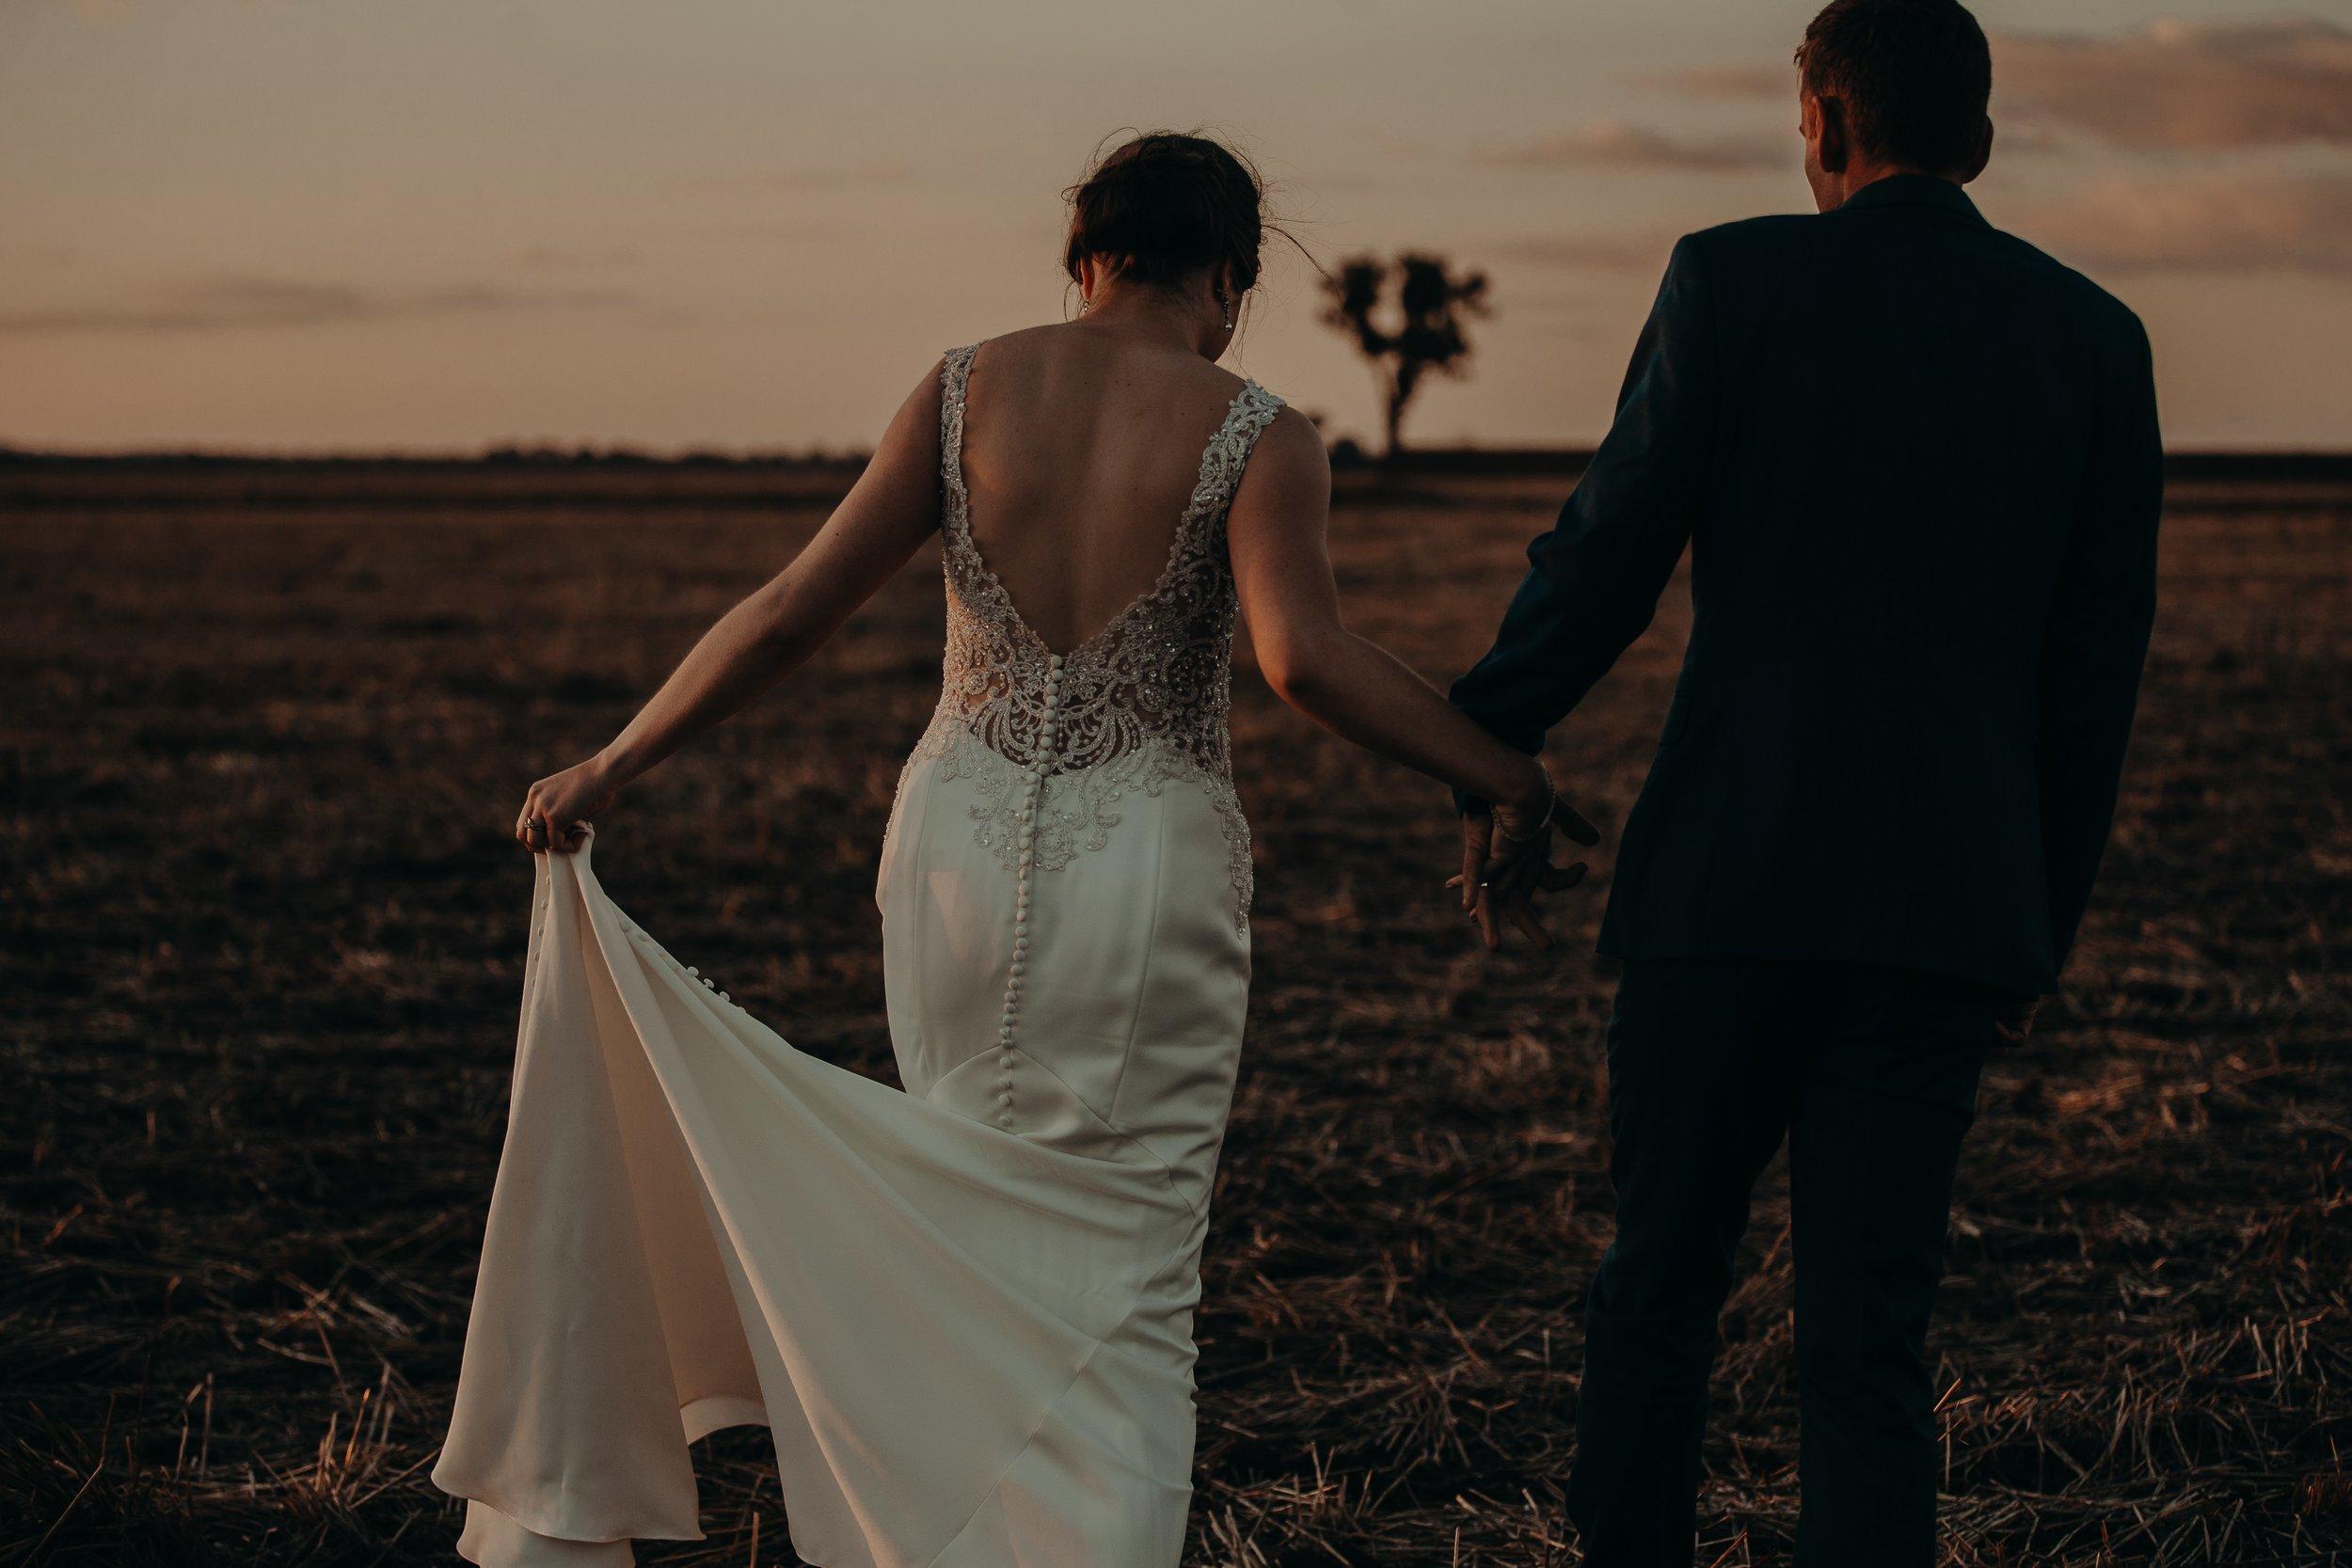 mickalathomas_puremacphotography_weddingphotographer_couplephotographer_Sheppartonphotographer_2571.jpg